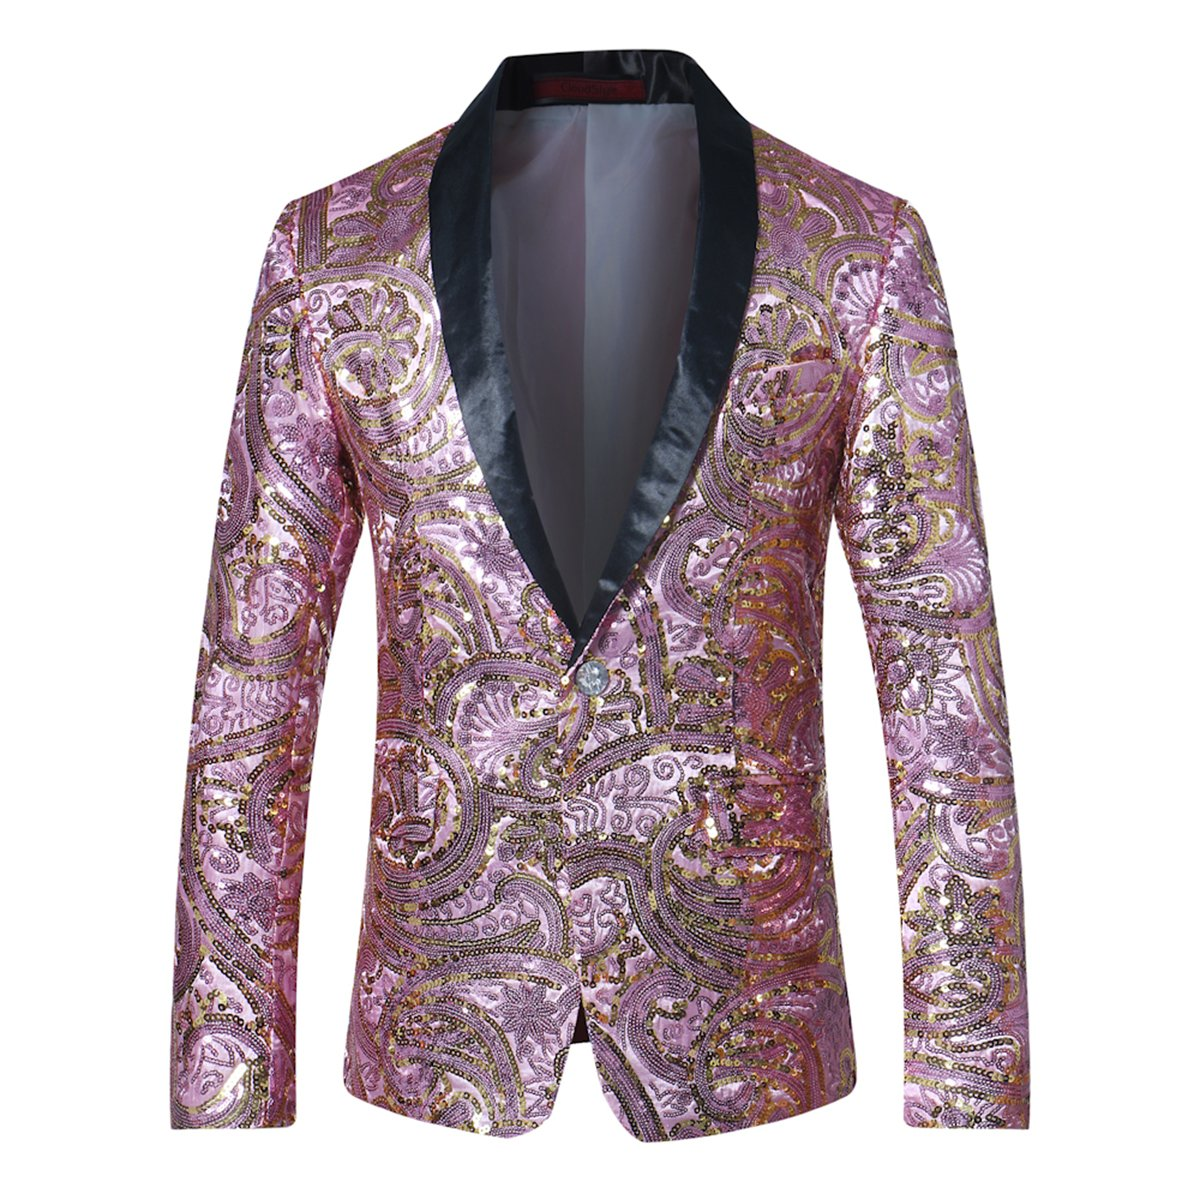 Cloudstyle Mens Blazer One Button Dress Coat Prom Wedding Party Jacket Slim Fit Suit Separates